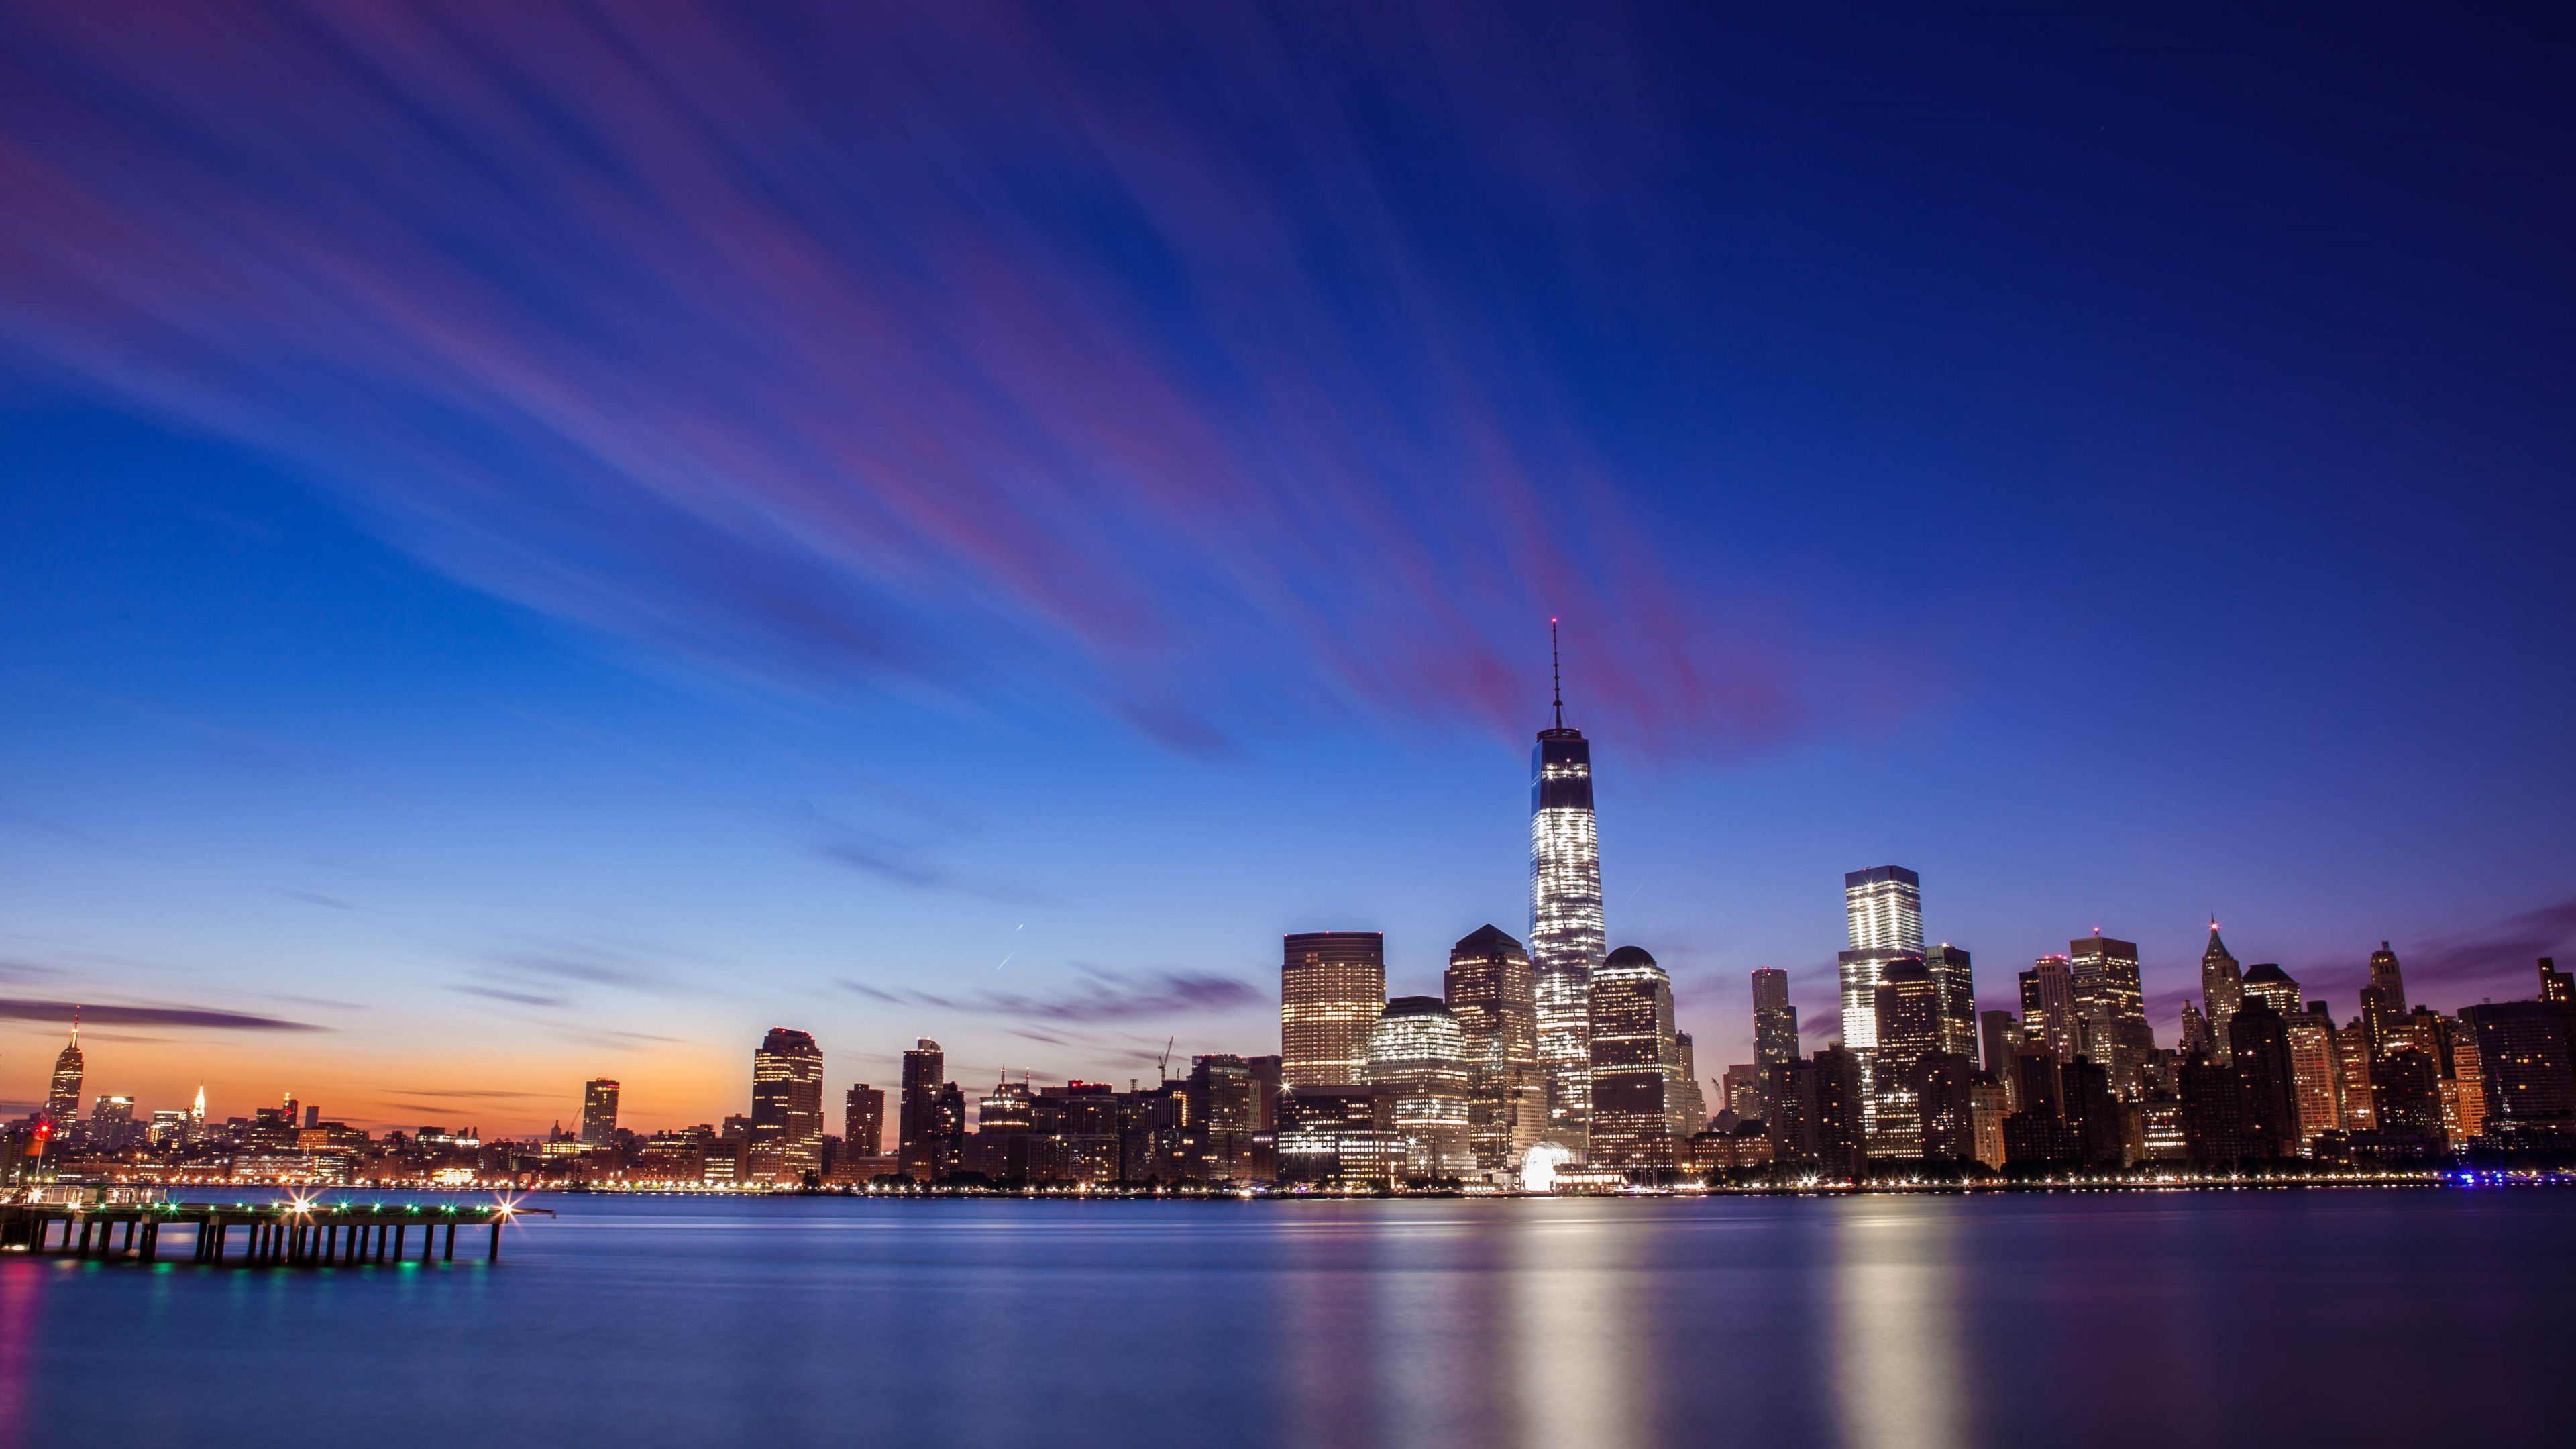 Pin By Samuel Costa On New York City New York New York Wallpaper Nyc Skyline York Wallpaper